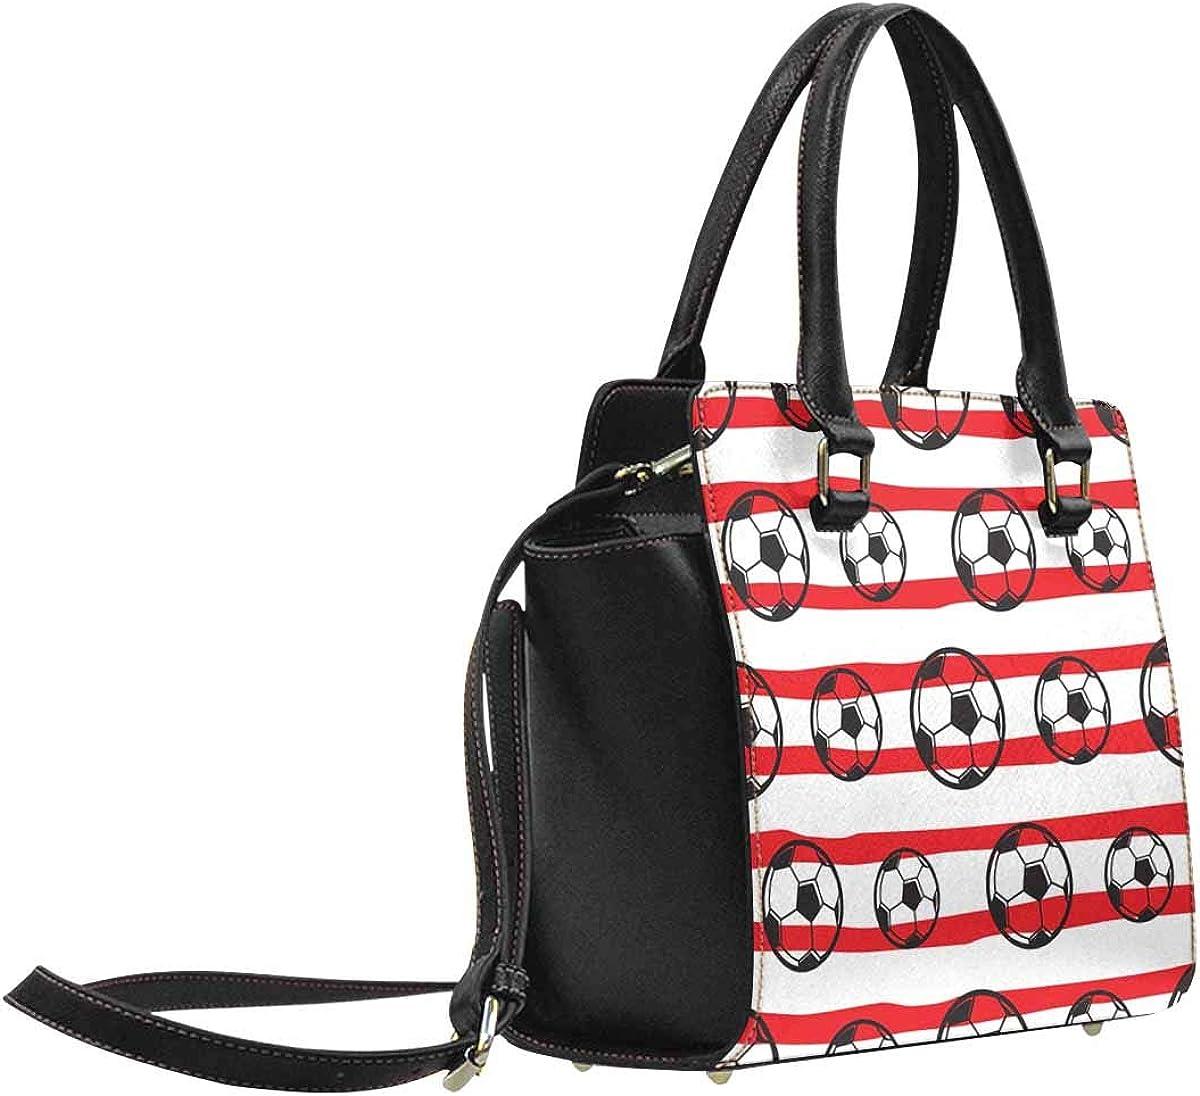 Stars and Bats PU Leather Classic Shoulder Handbag Tote Bag Pumpkins INTERESTPRINT Halloween Pattern with Ghosts